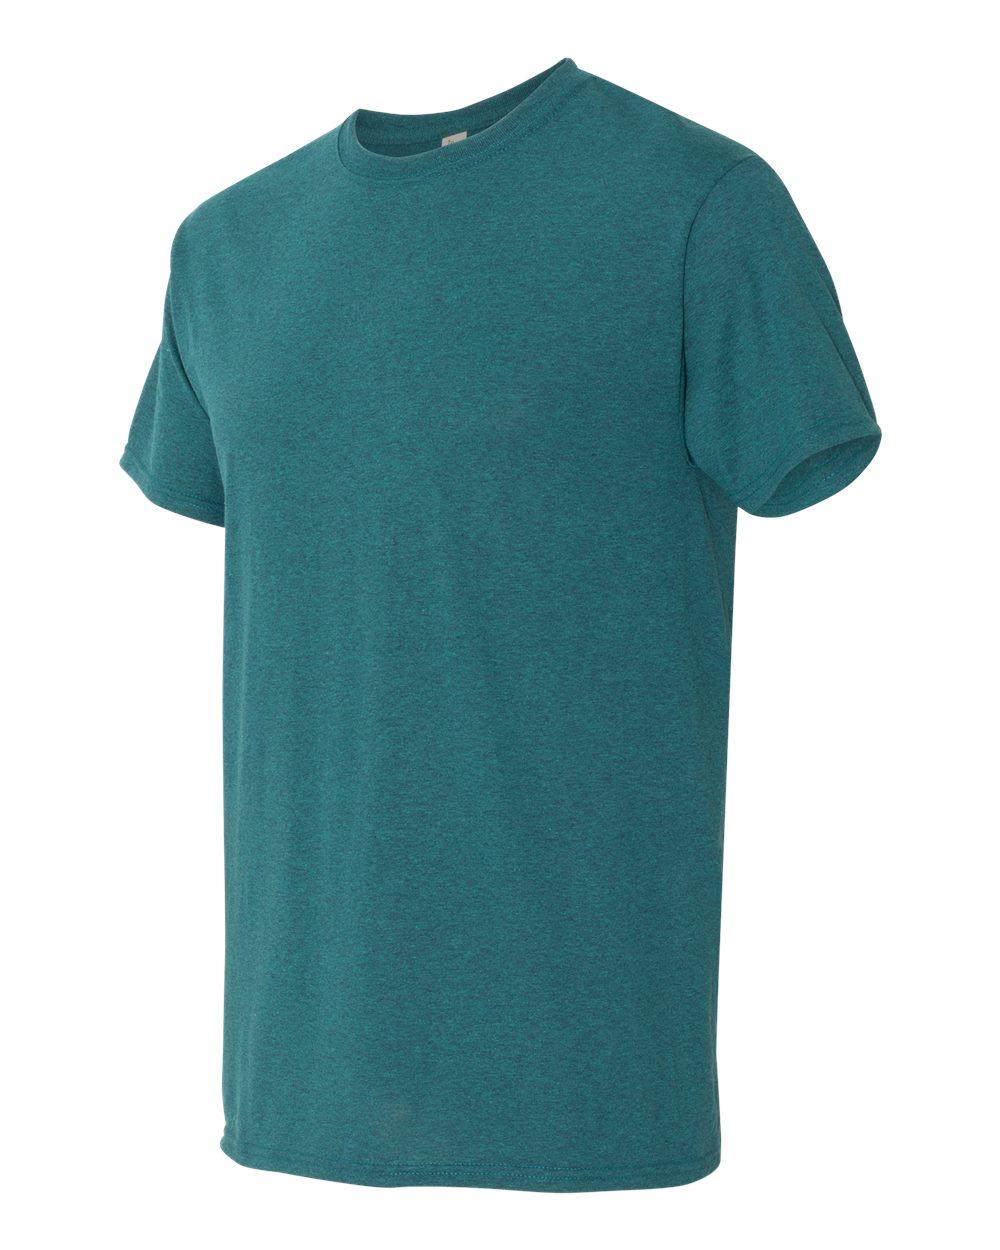 4df4e60f Jerzees 601MR - Dri-Power Active Triblend T-Shirt $3.74 - Men's T-Shirts